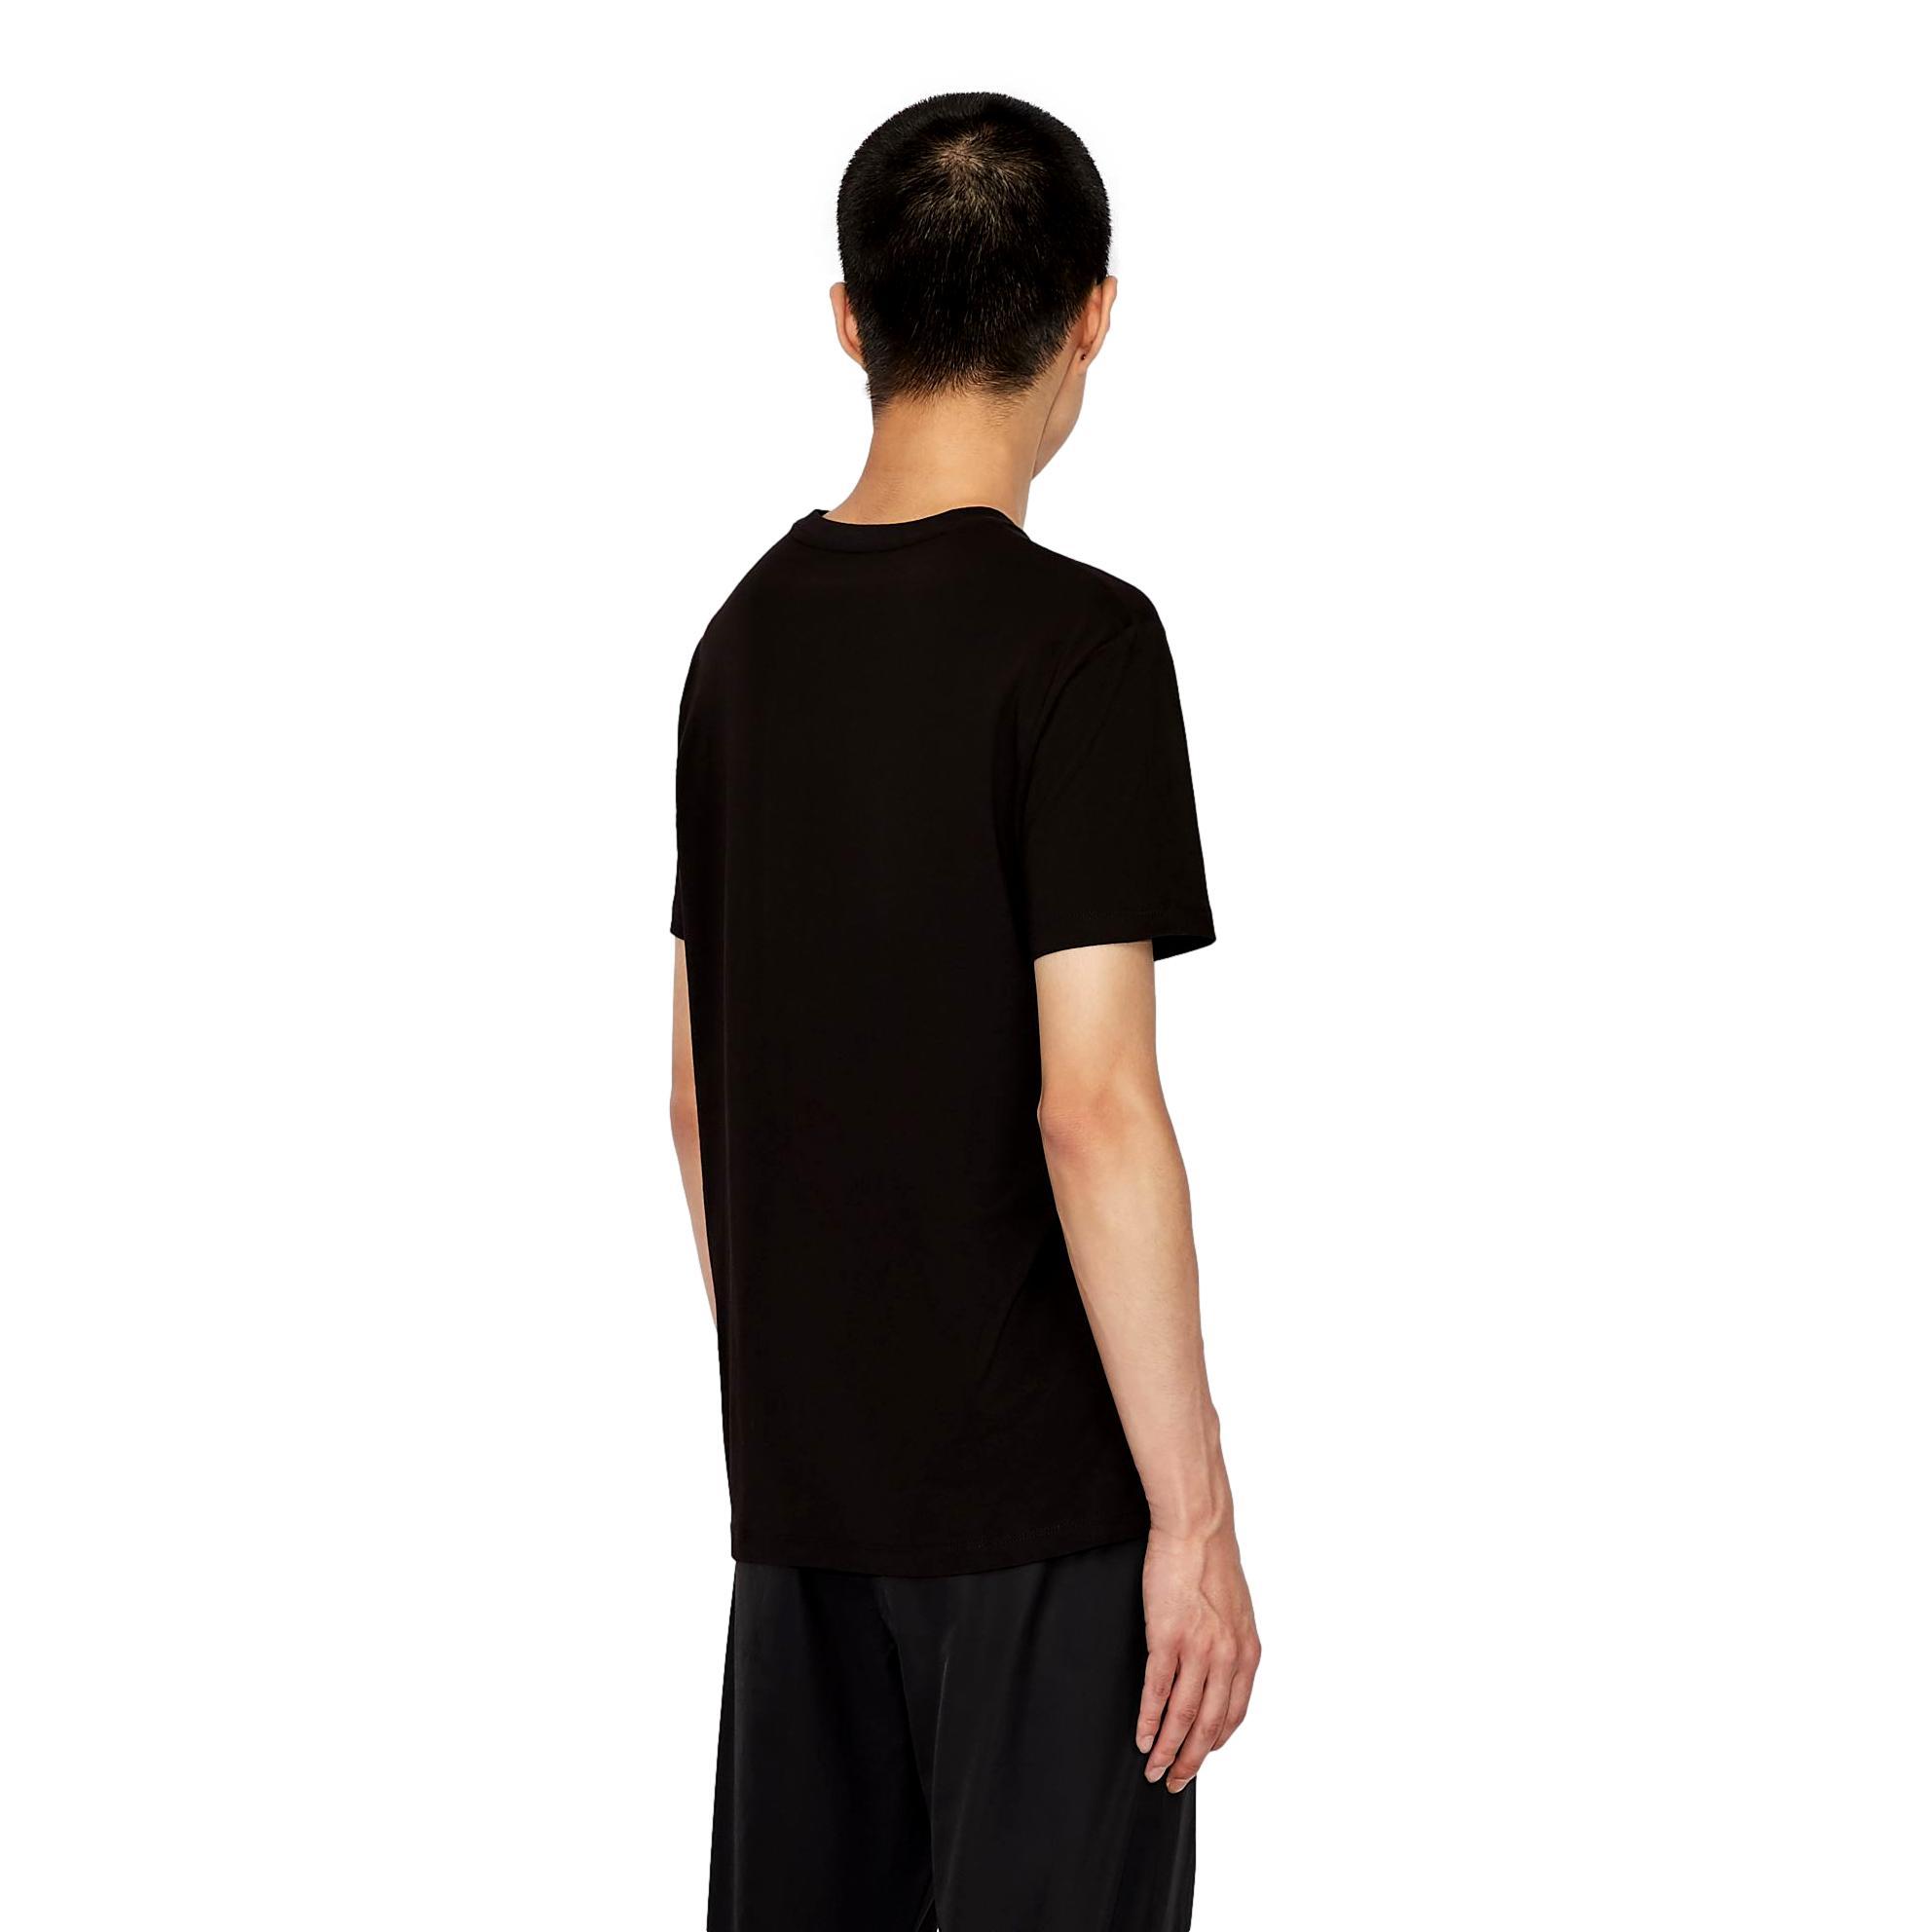 Slim fit T-shirt with shiny maxi-logo ARMANI EXCHANGE |  | 6KZTFA ZJBVZ1200